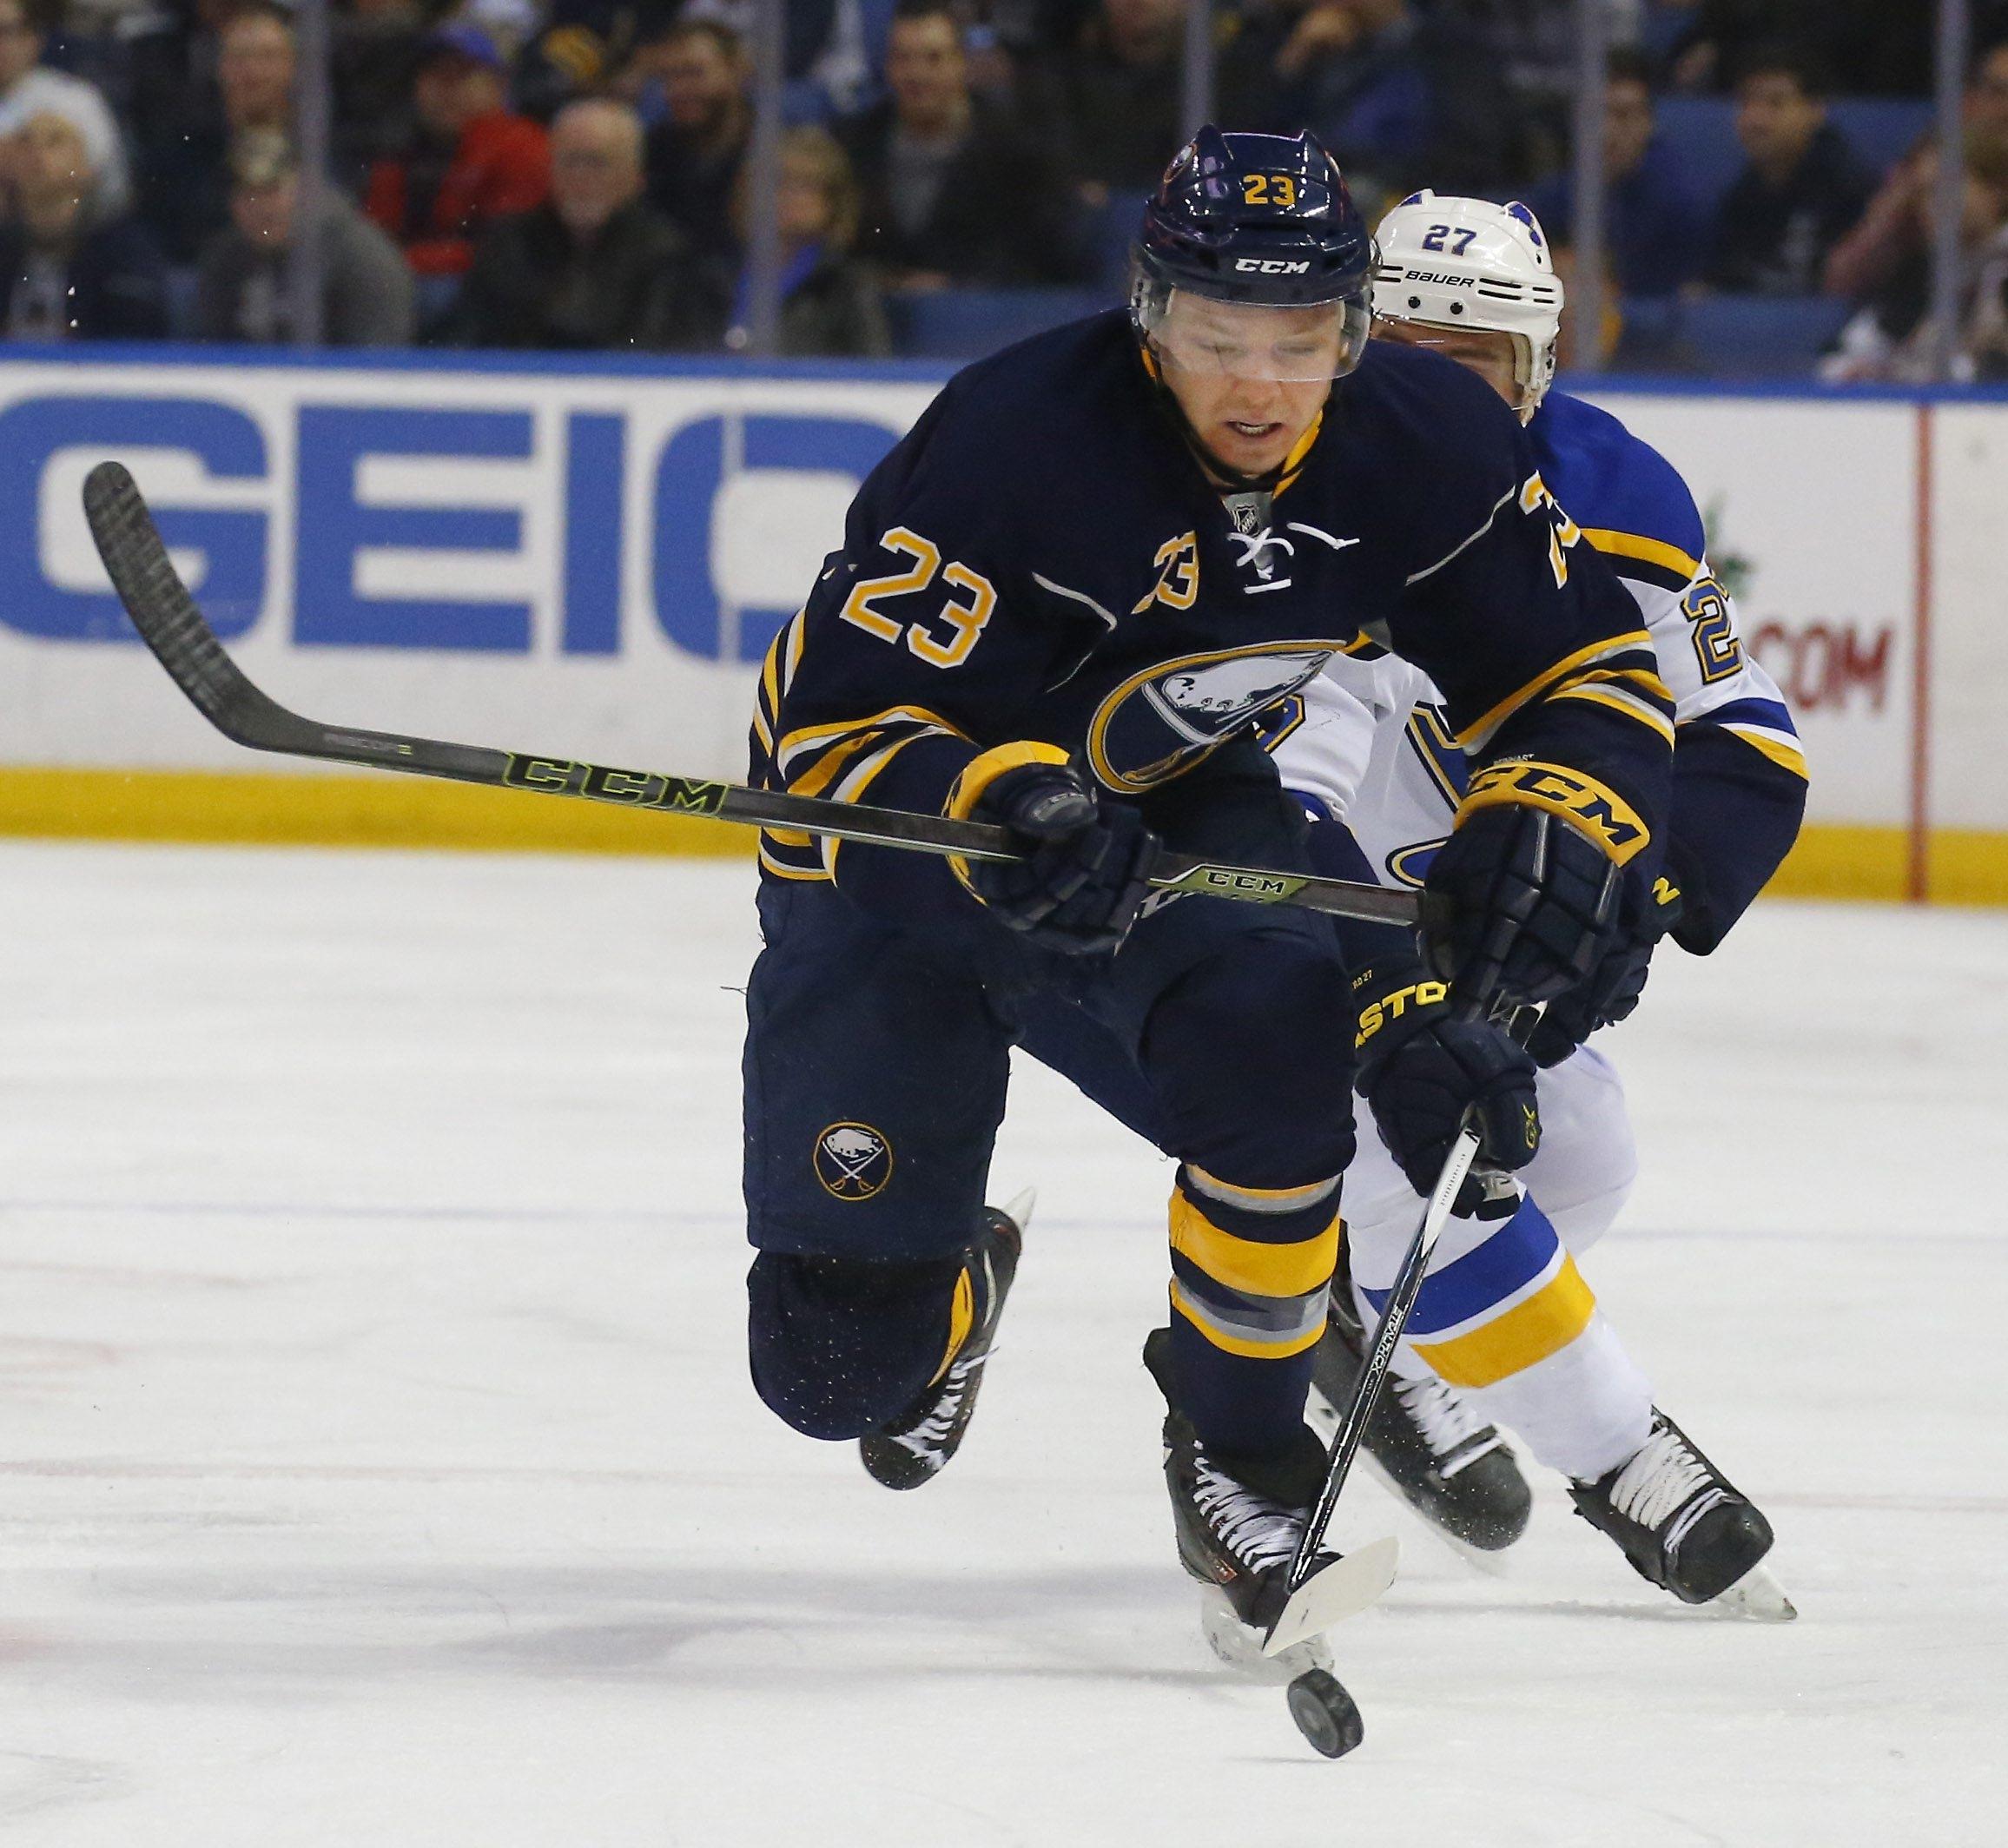 Sam Reinhart is a pretty good rookie, too.  (Buffalo News photo)